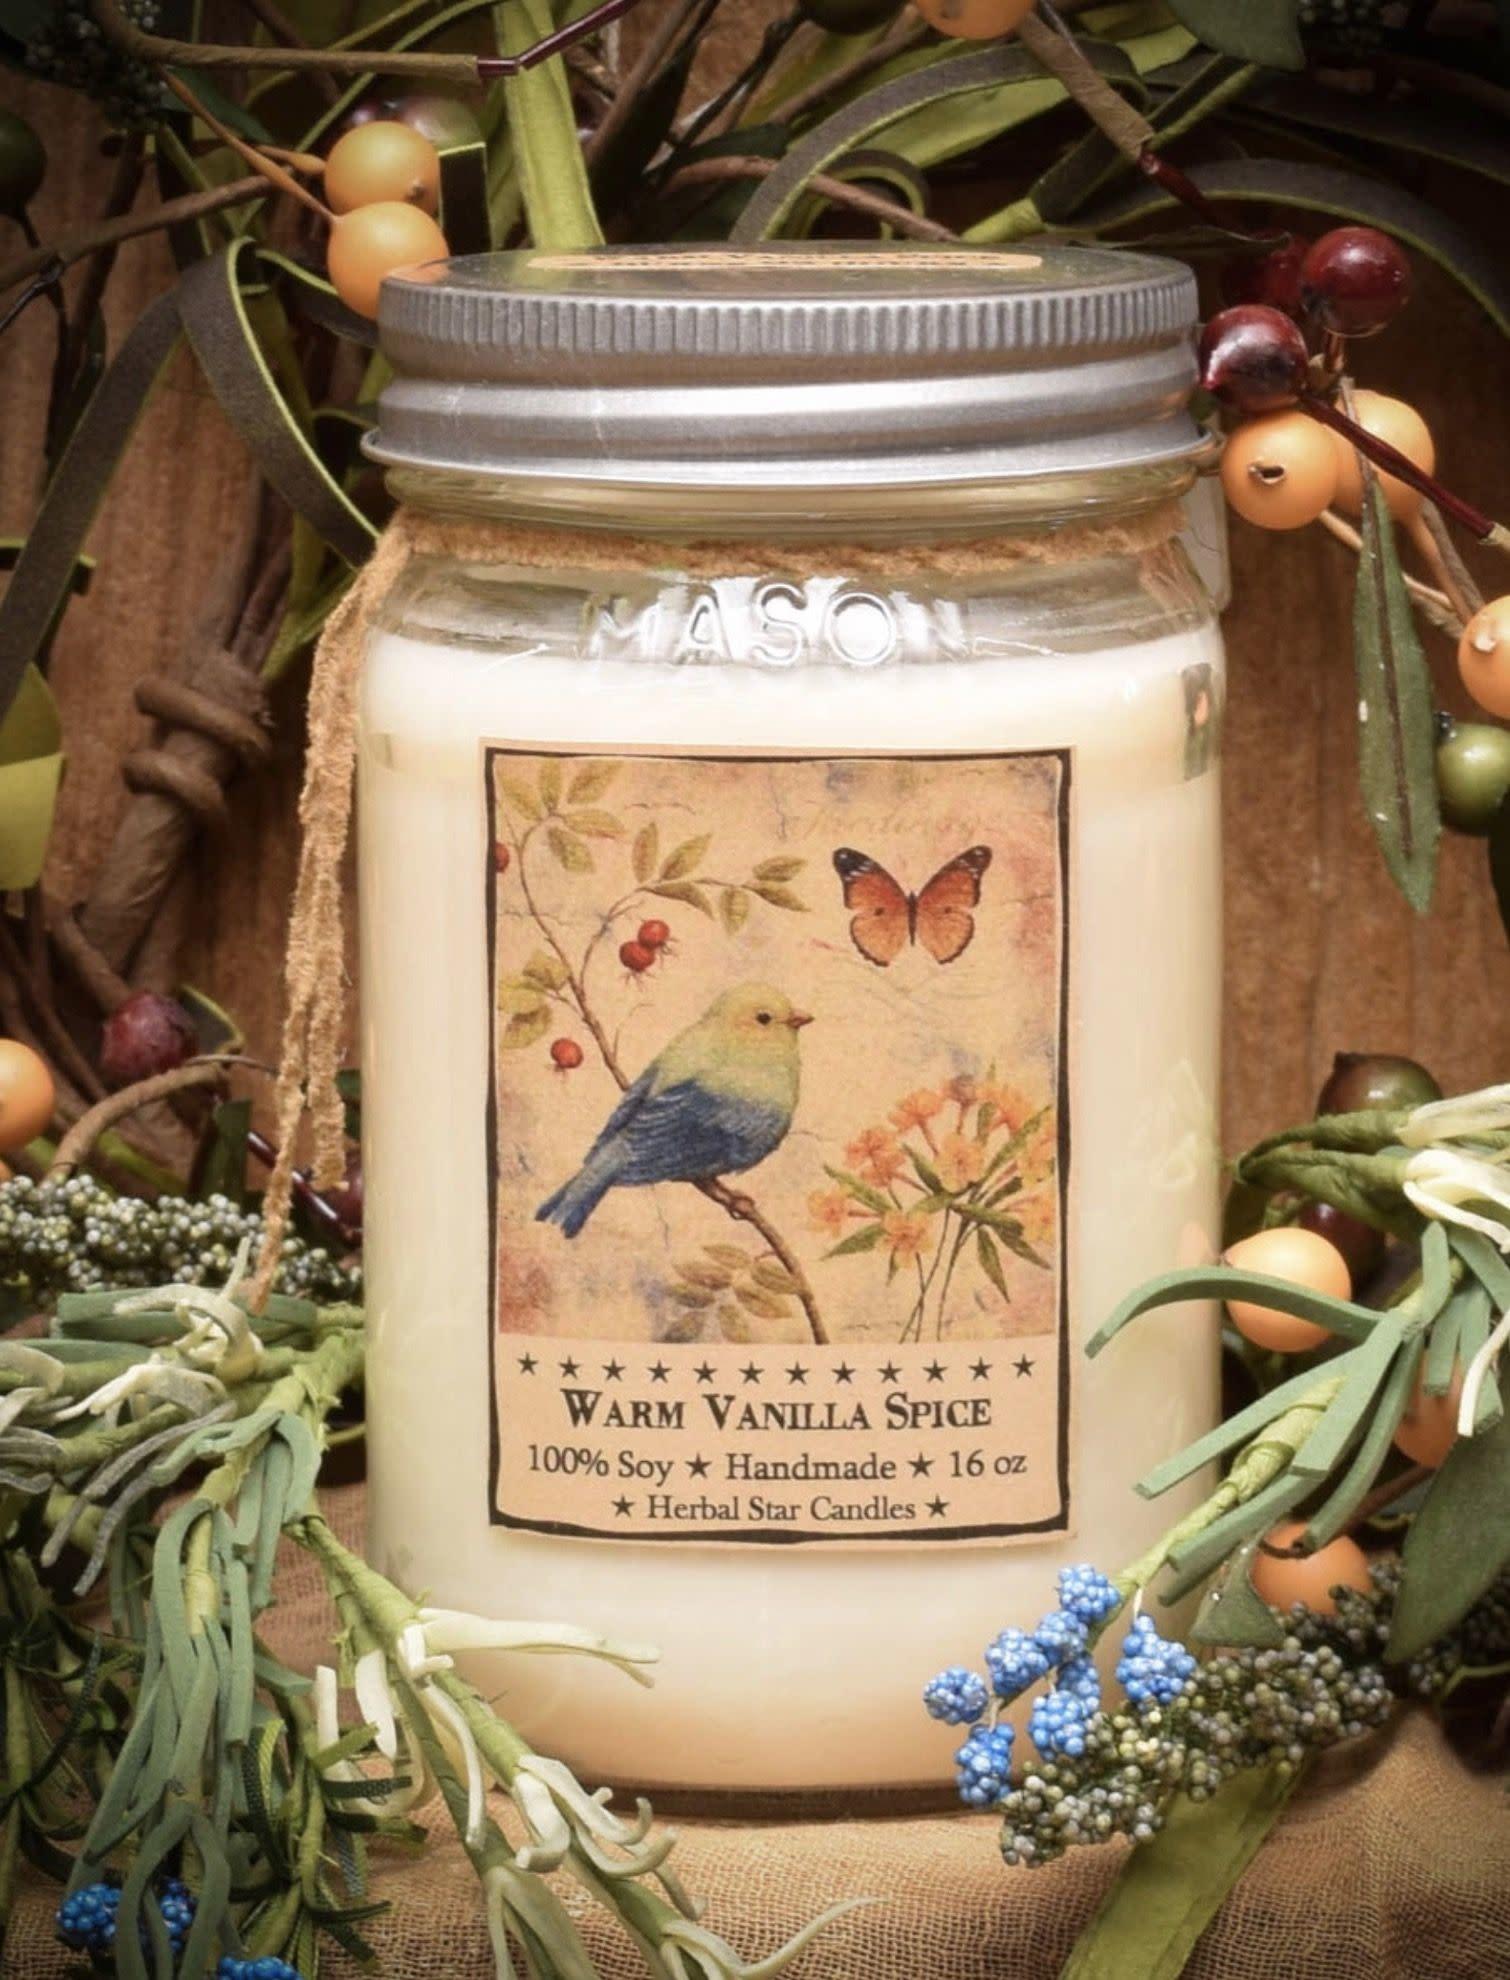 Herbal Star Candles Warm Vanilla Spice Soy Jar Candle 16oz